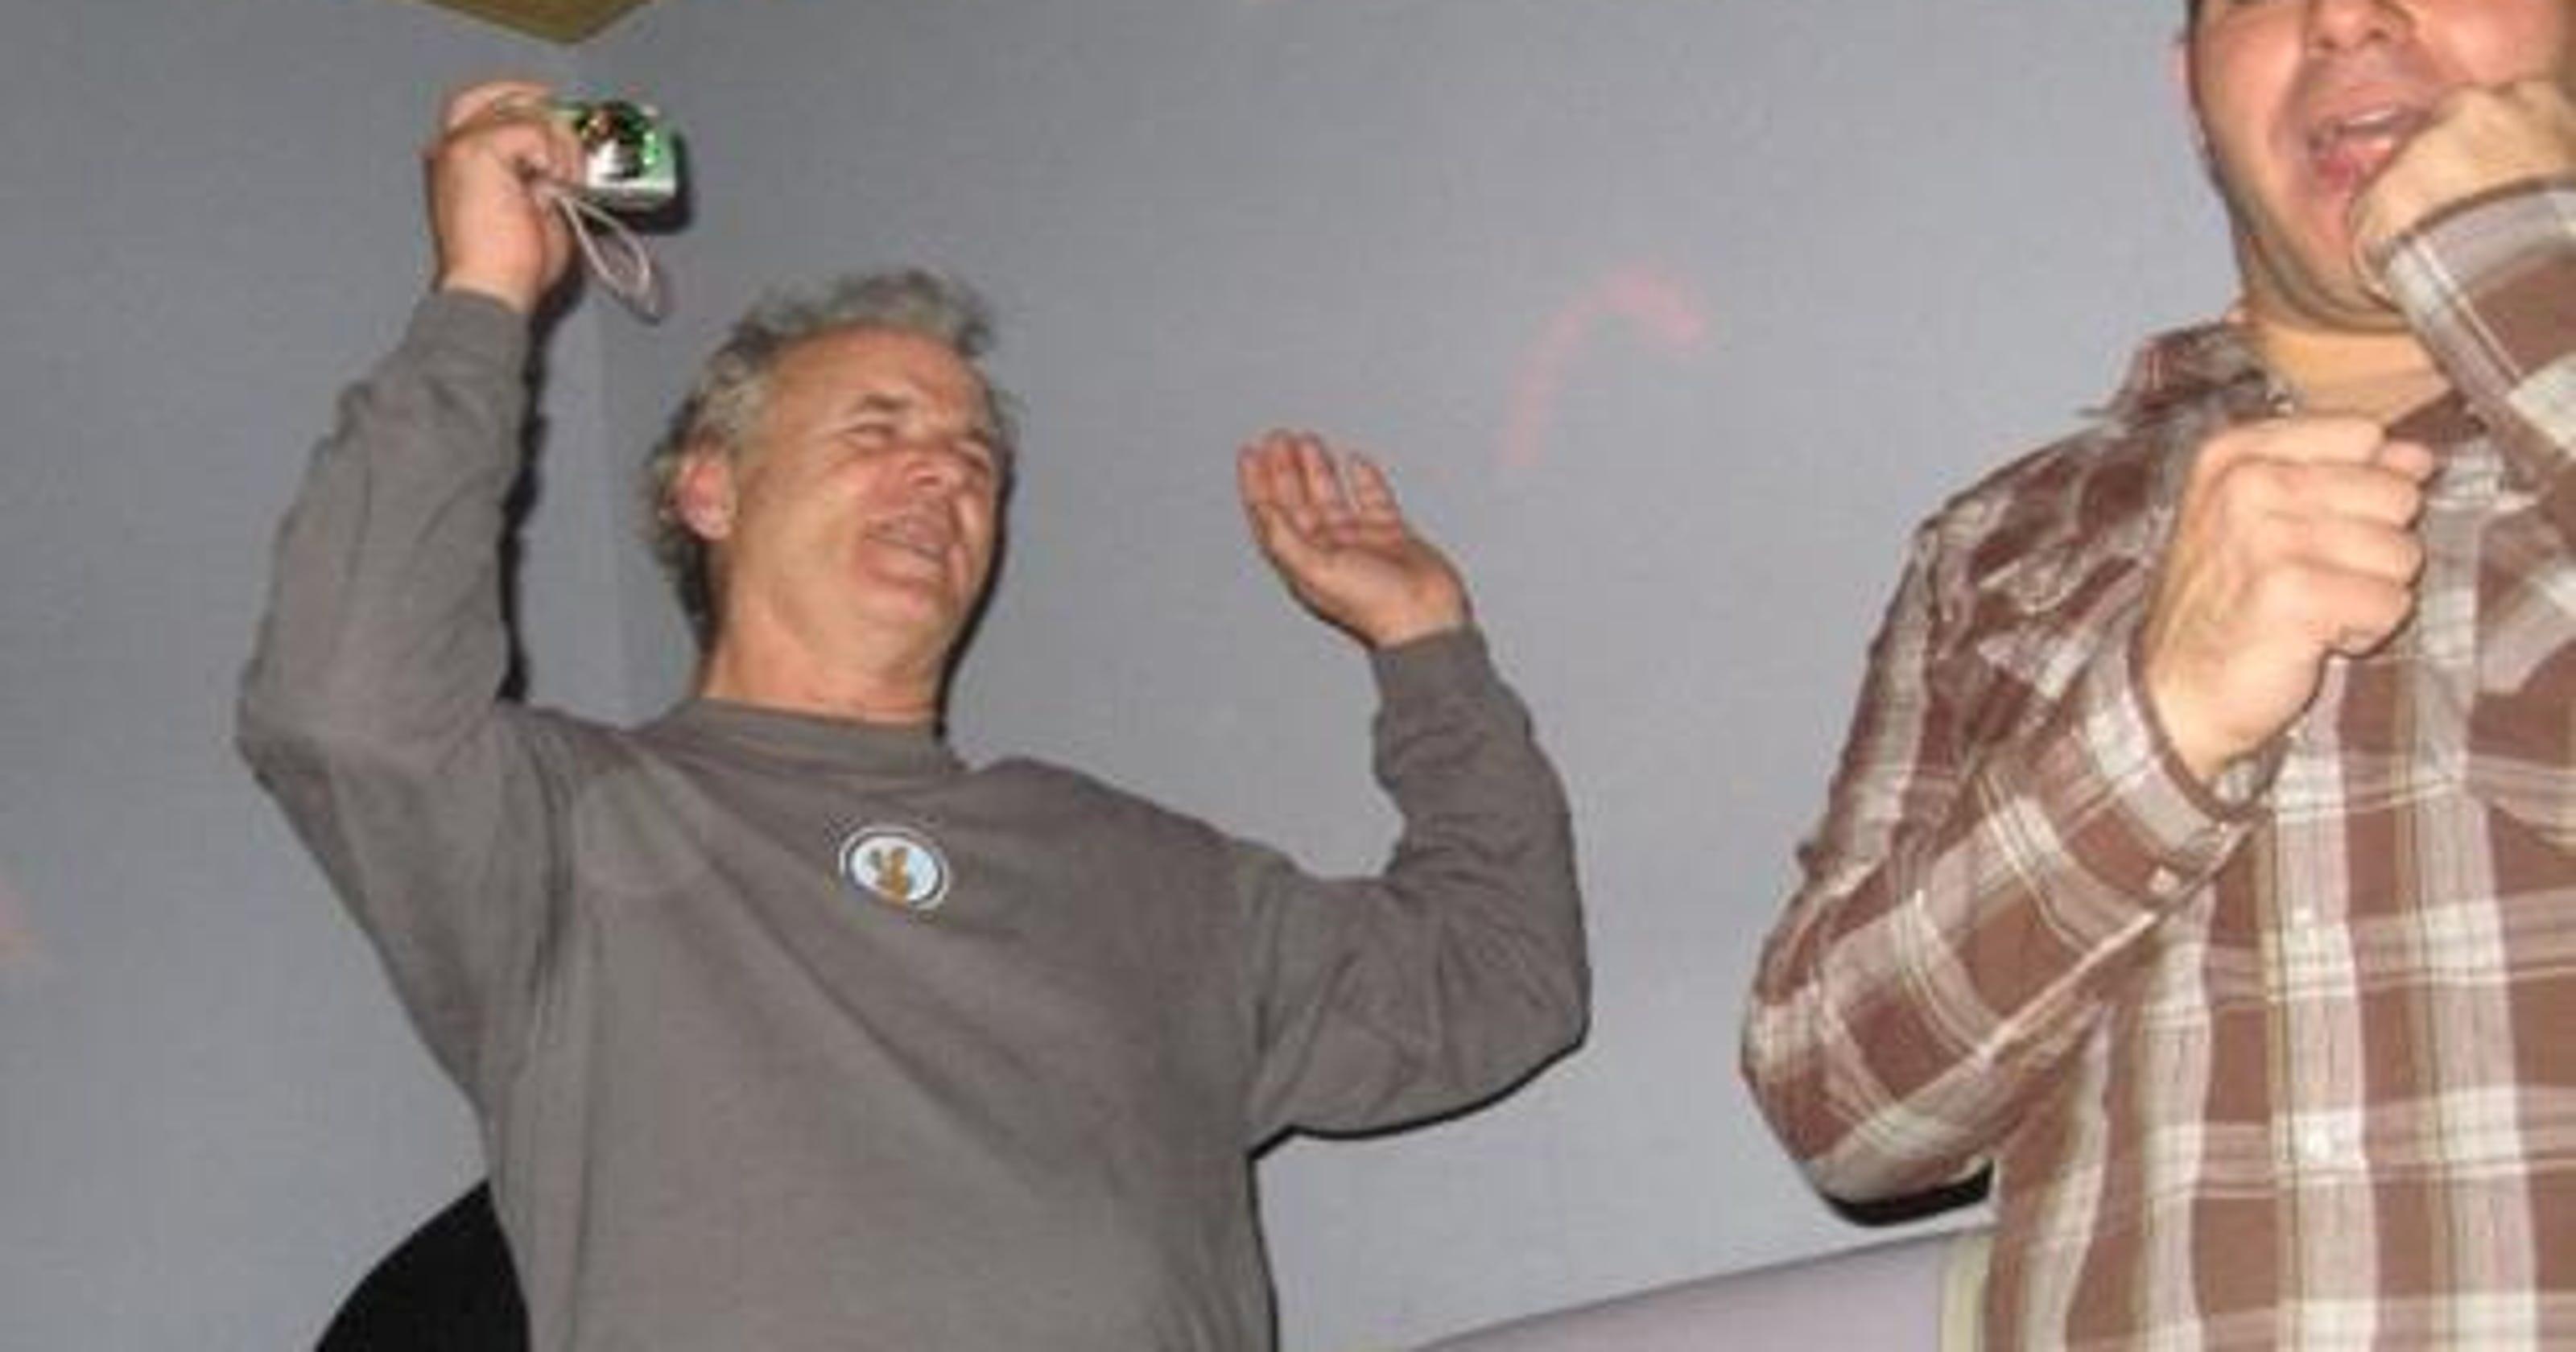 bill-murray-urban-legends-no-one-will-ever-believe-you